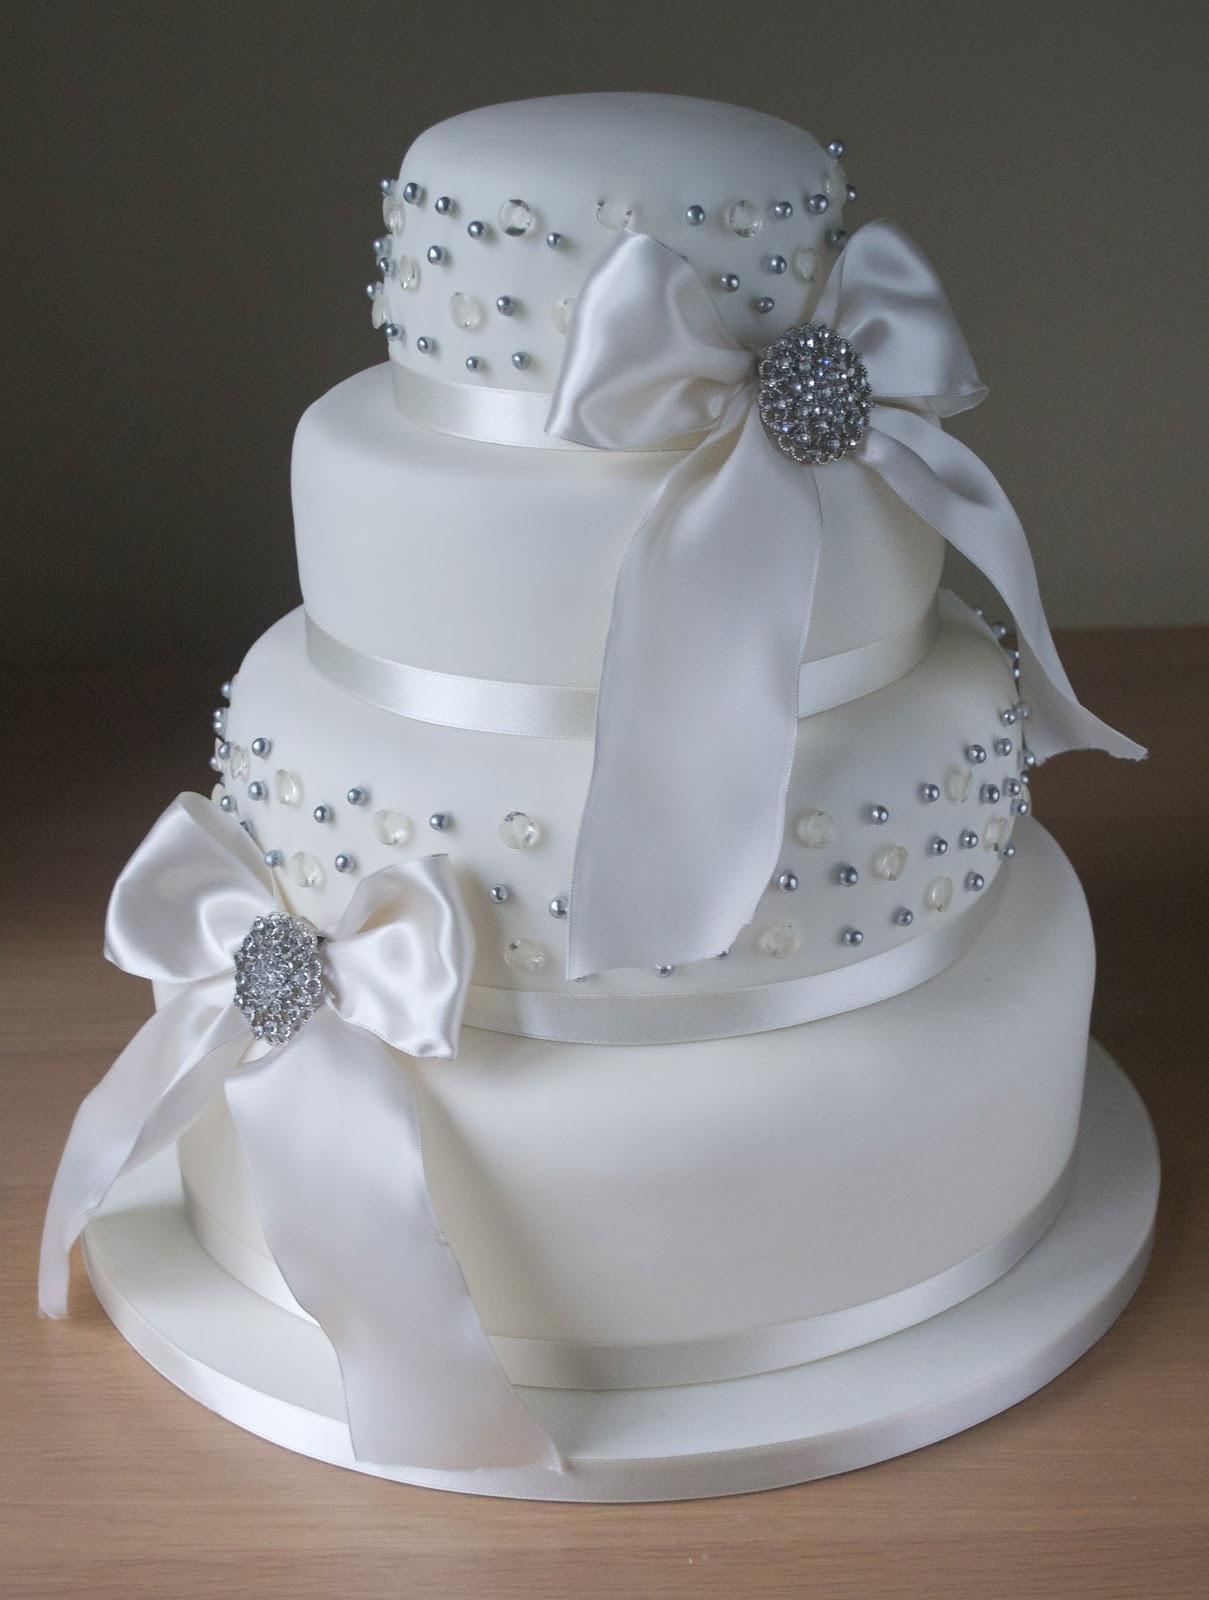 Wedding Cakes with Diamonds the Best Ideas for Sugar Ruffles Elegant Wedding Cakes Barrow In Furness